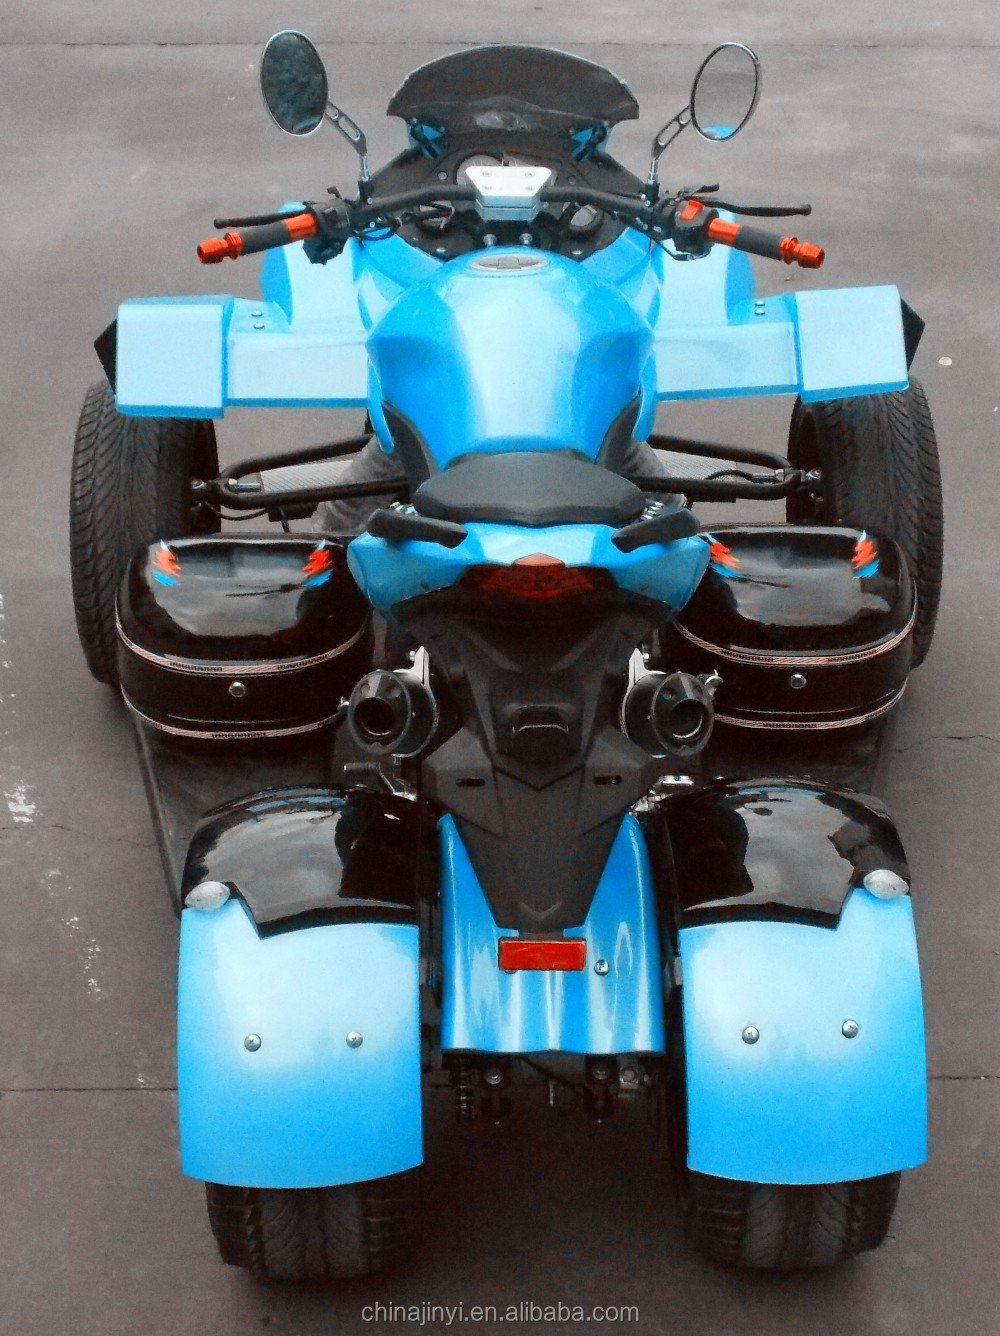 China Fabrik 250cc Amphibien Buggy Für Verkauf - Buy Product on ...